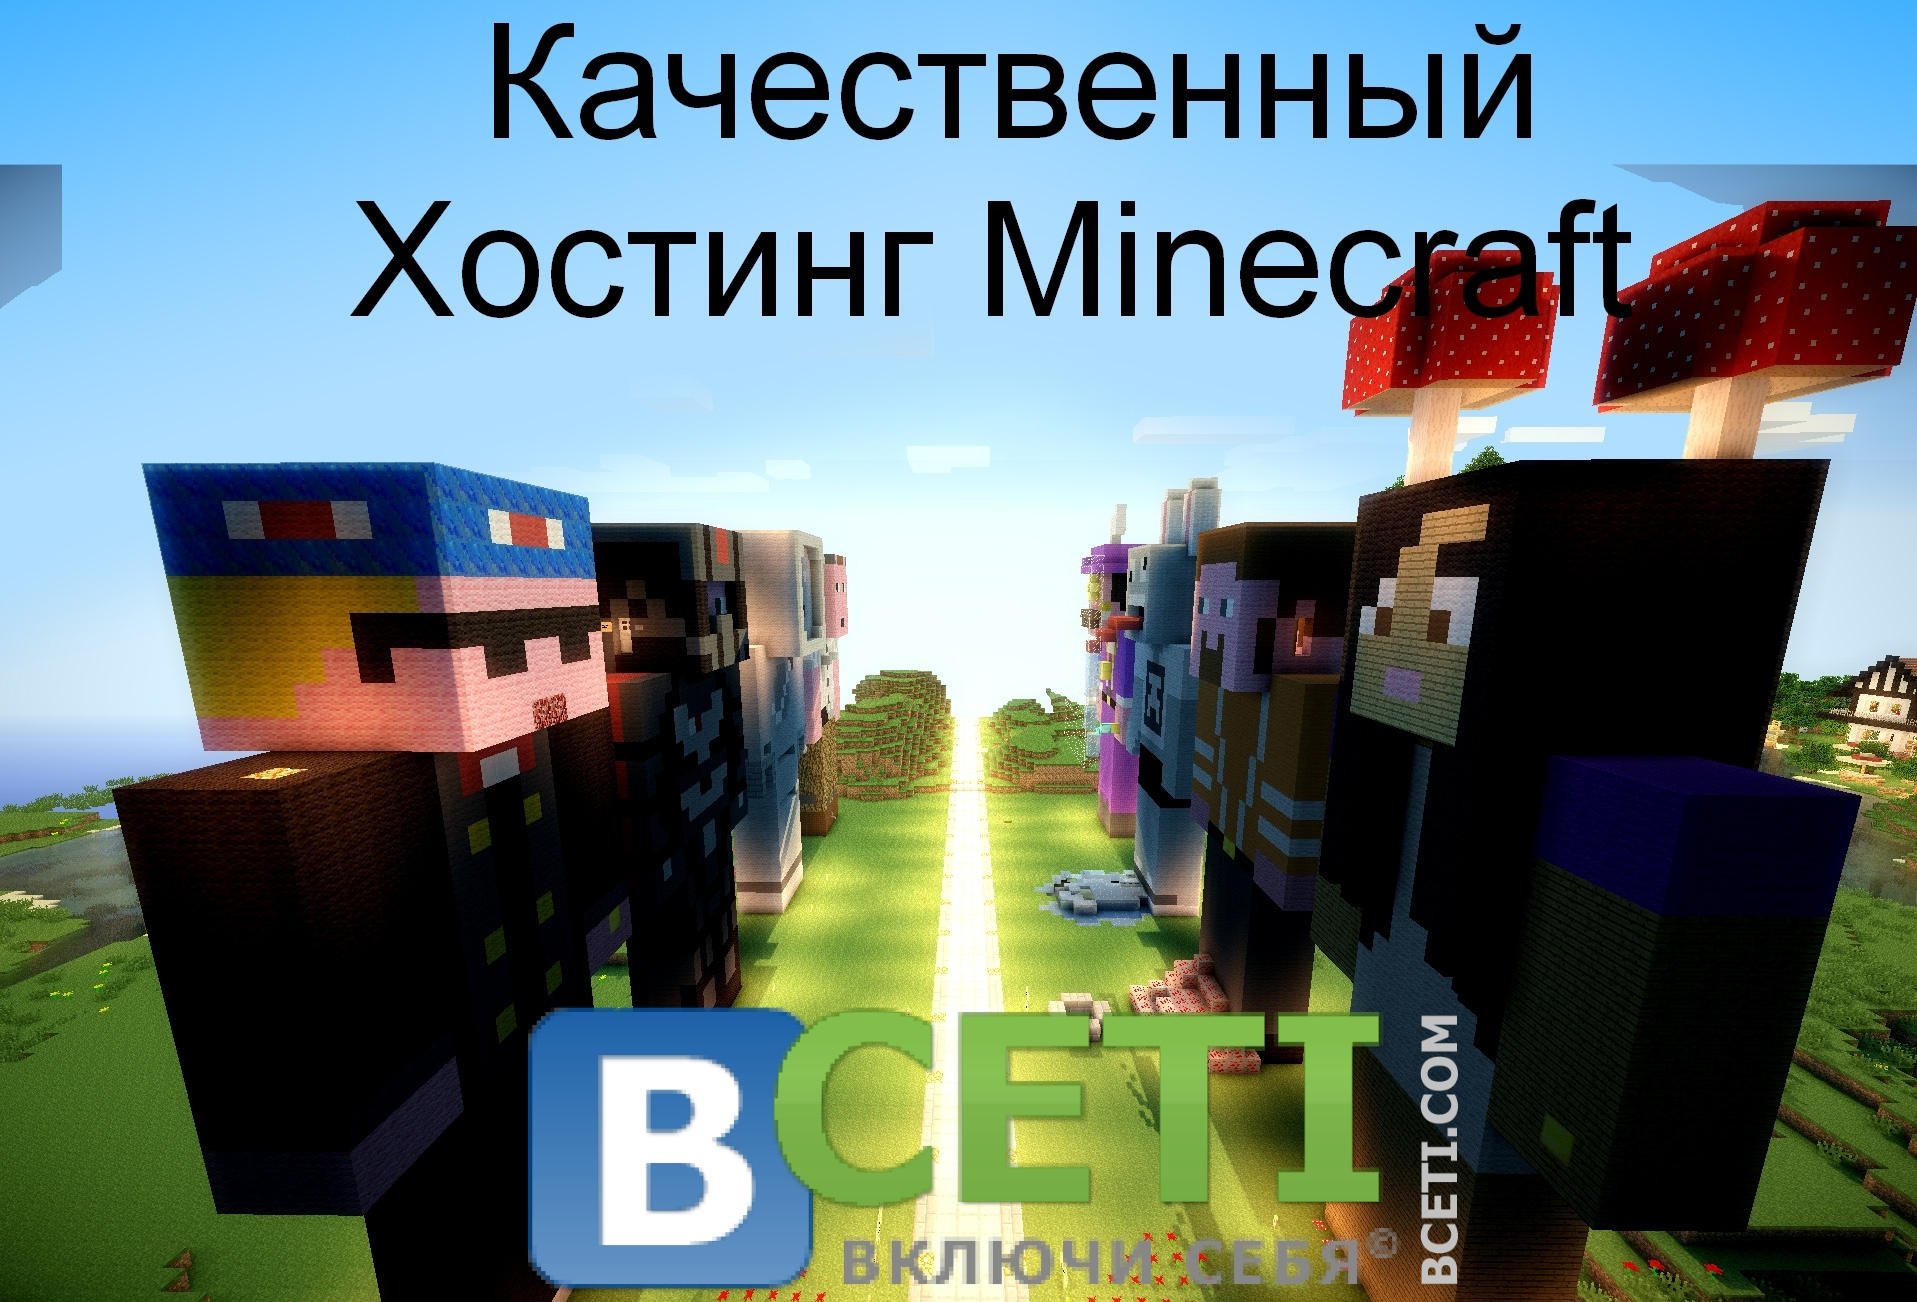 Хостинг серверов Майнкрафт q2e.ru. Хостинг Minecraft для ...